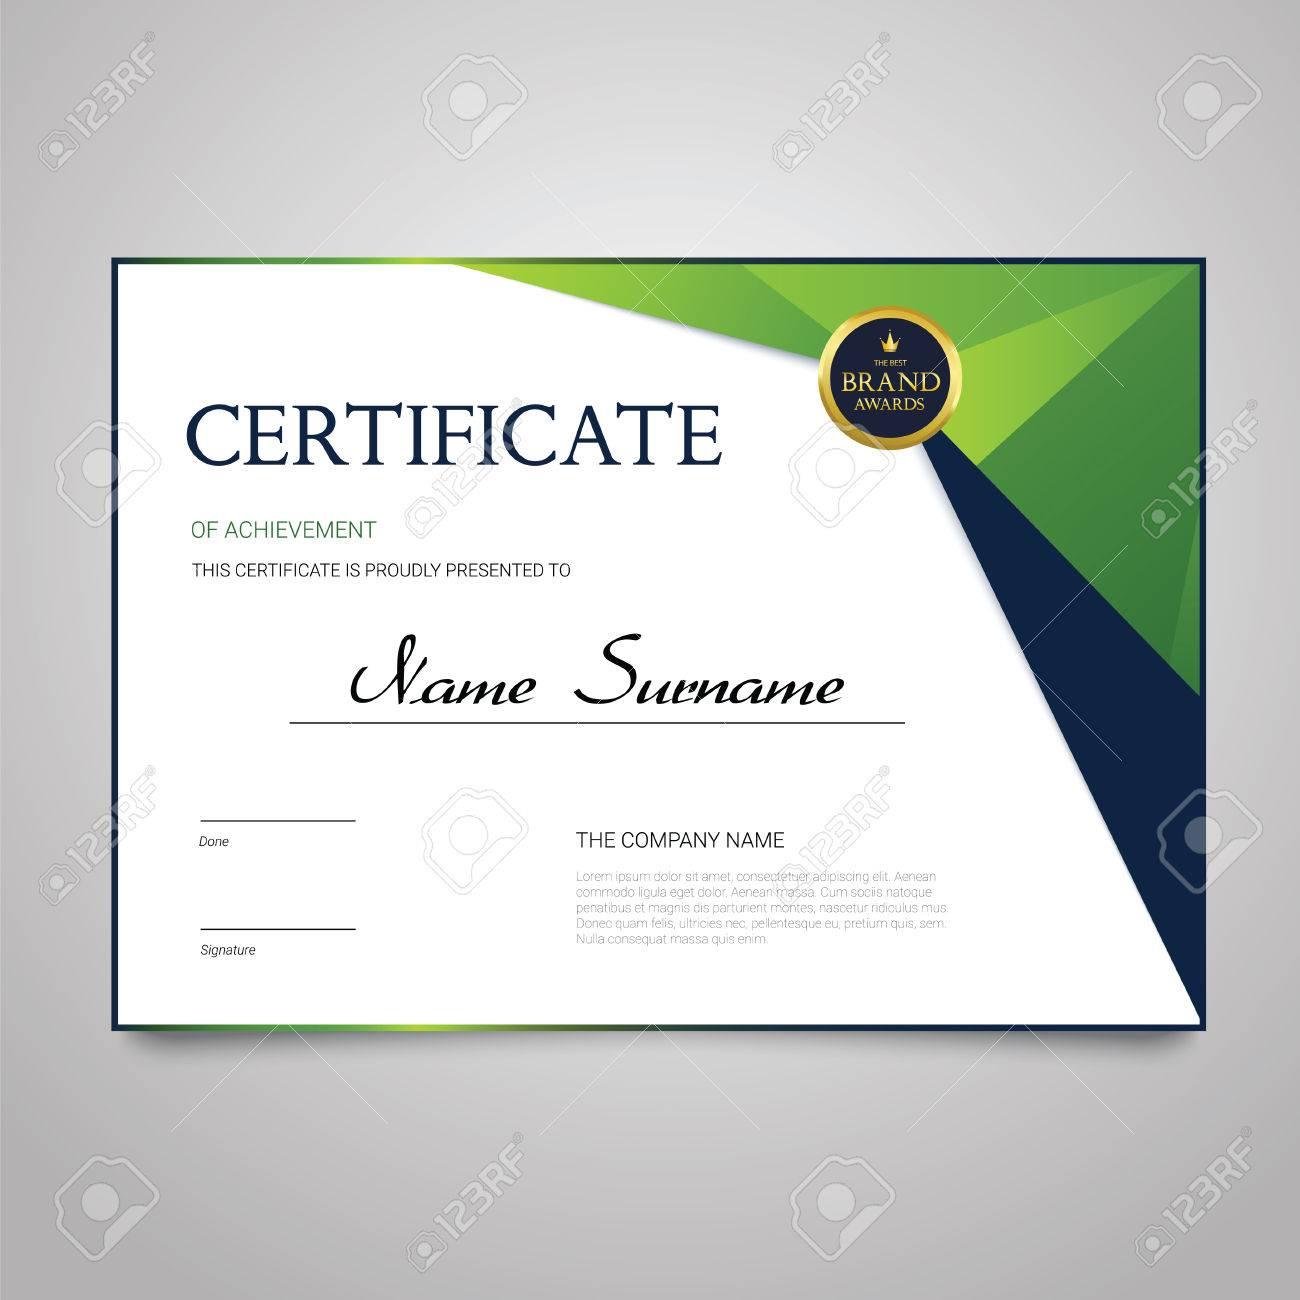 Certificate - horizontal elegant vector document - 81448248